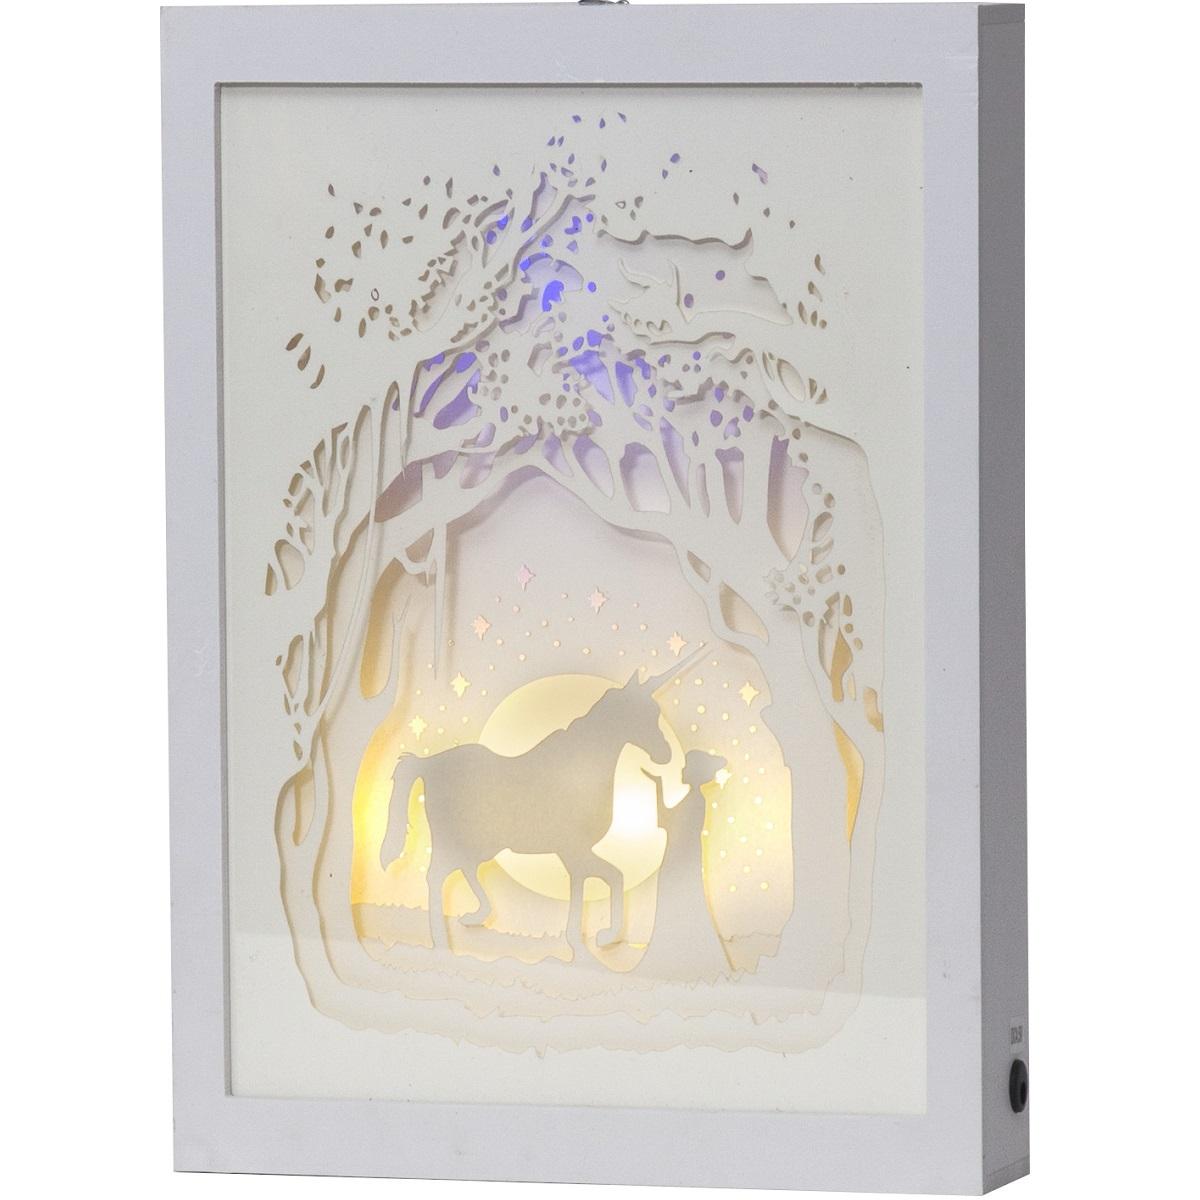 Led Batterie Oder Trafo Lichtdekoration Fur Wand Leuchtbild Szene